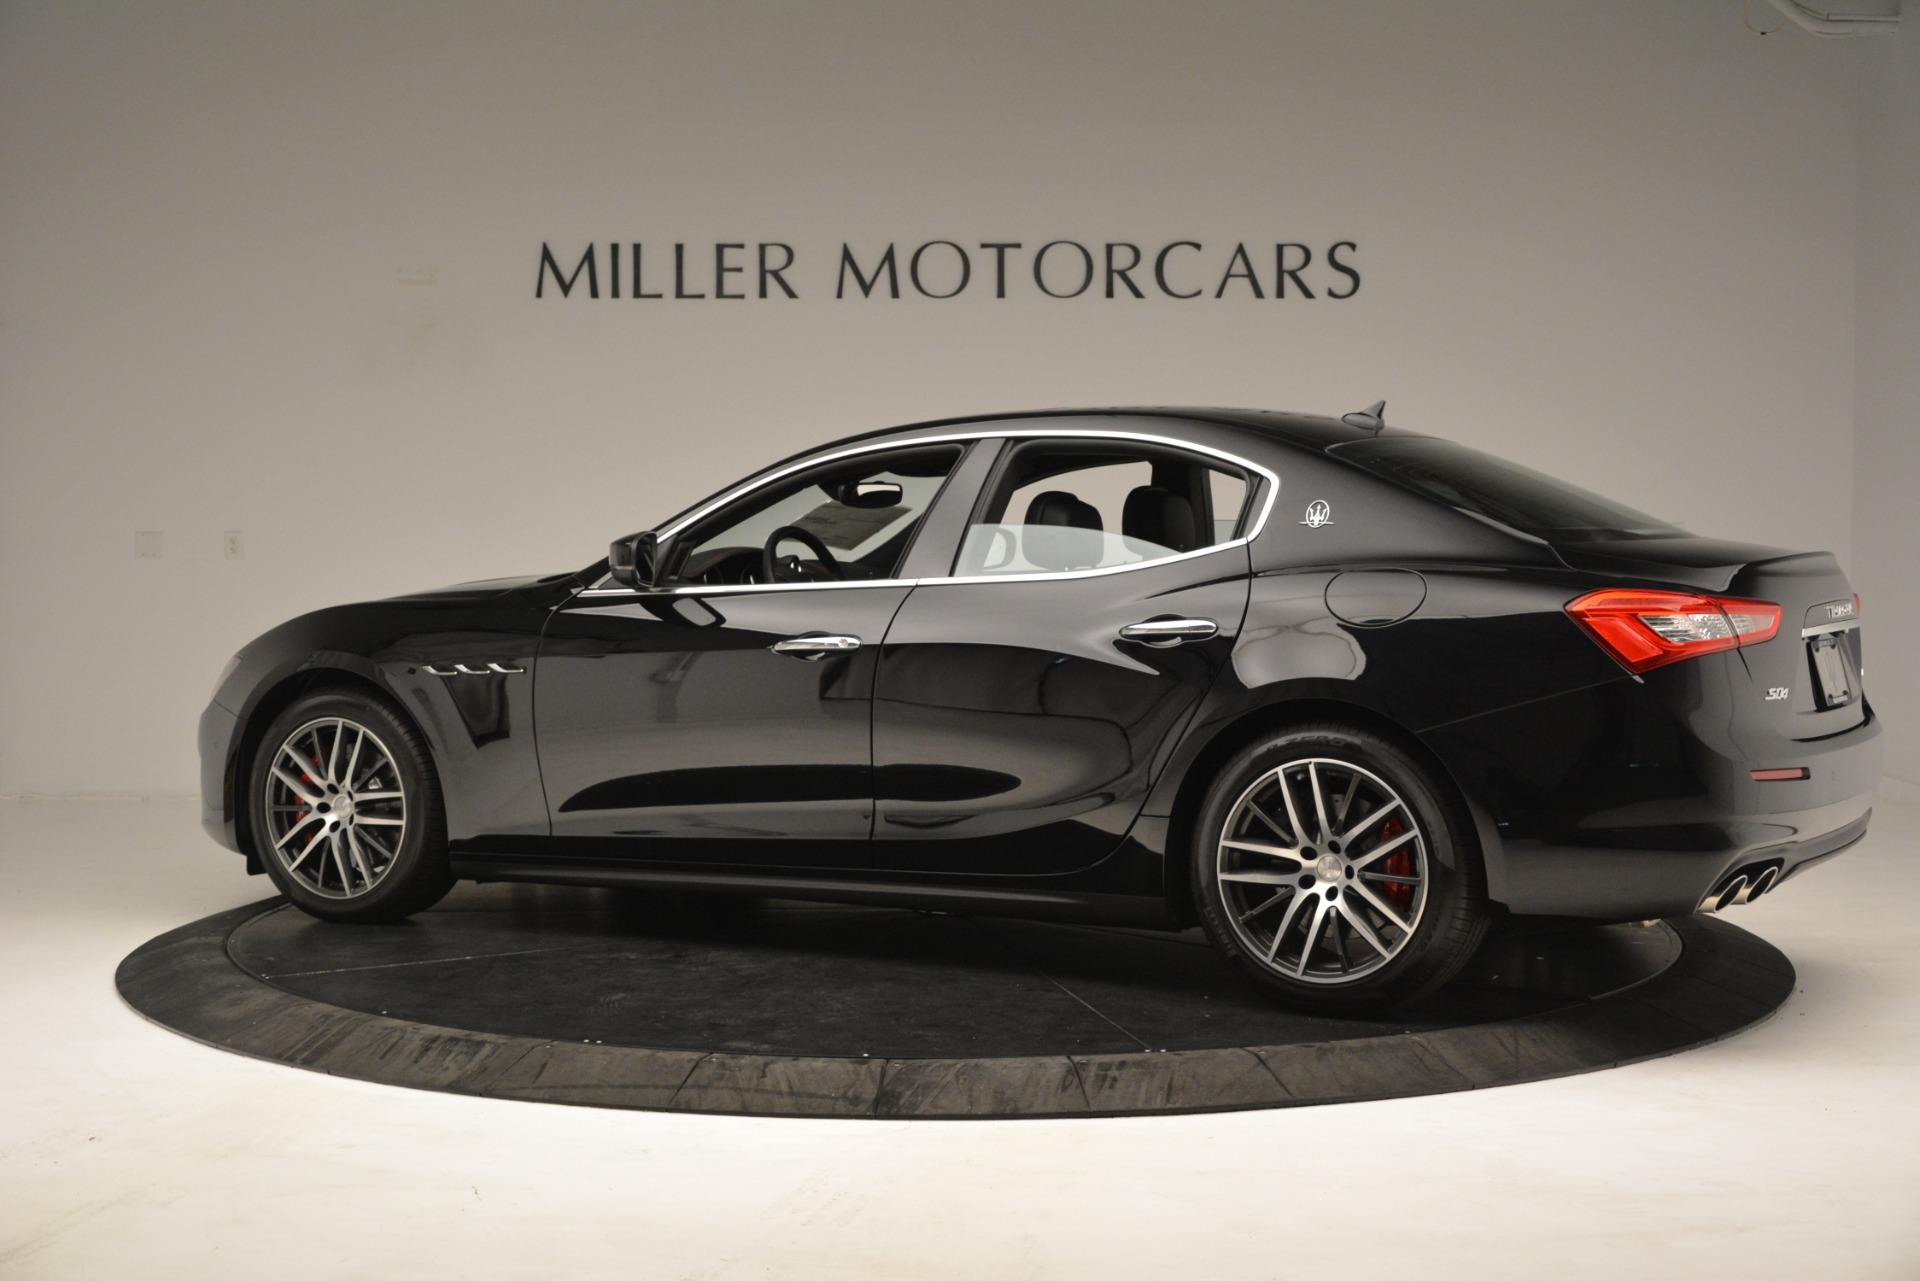 New 2019 Maserati Ghibli S Q4 For Sale 87505 In Greenwich, CT